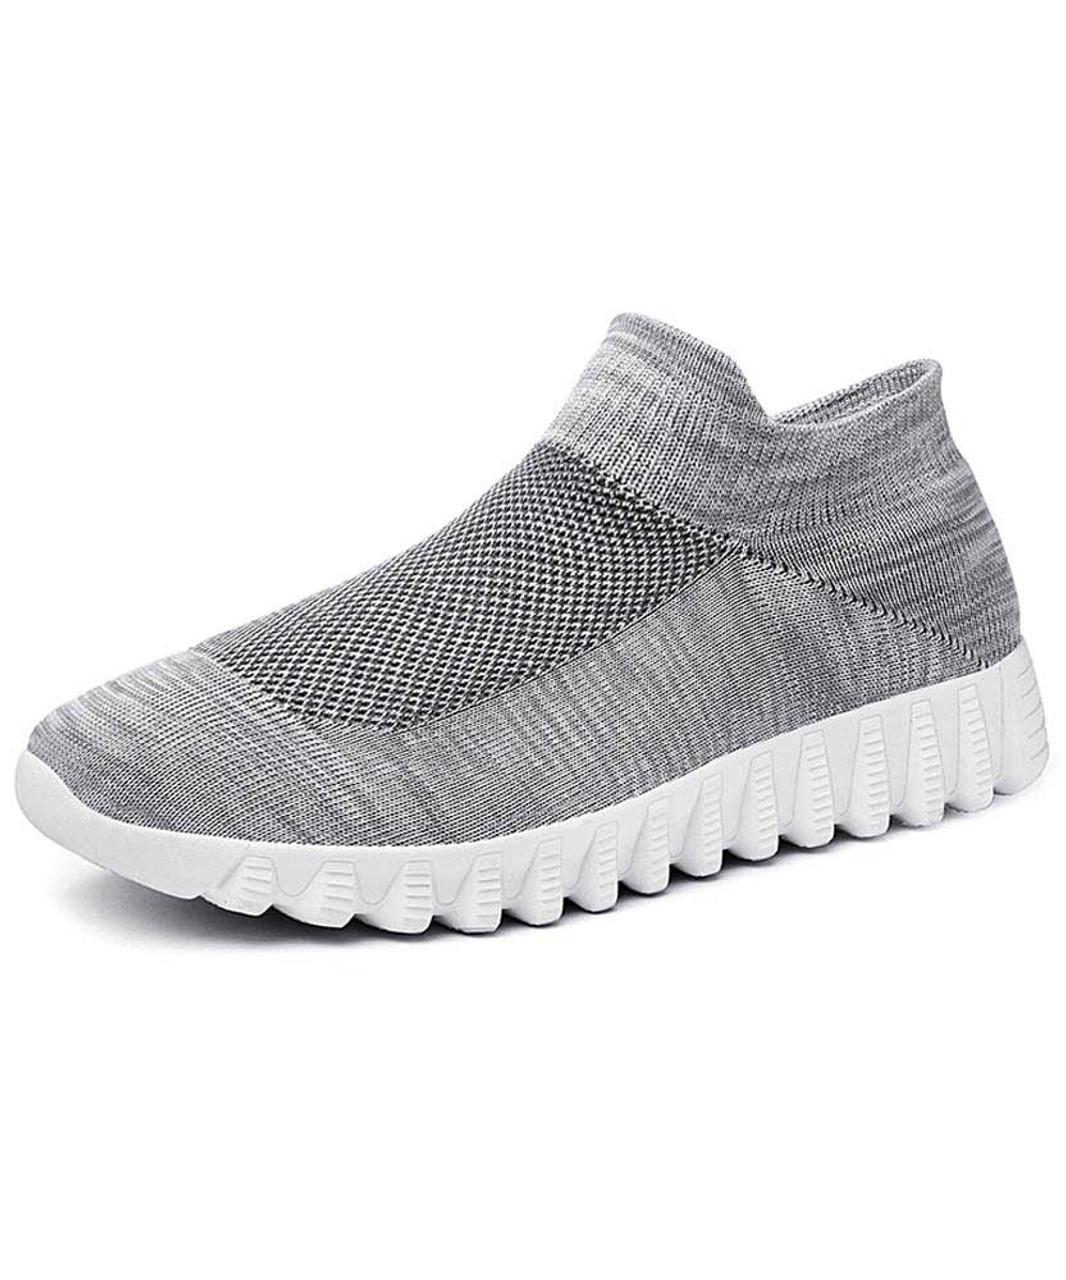 Grey flyknit textured slip on sock like